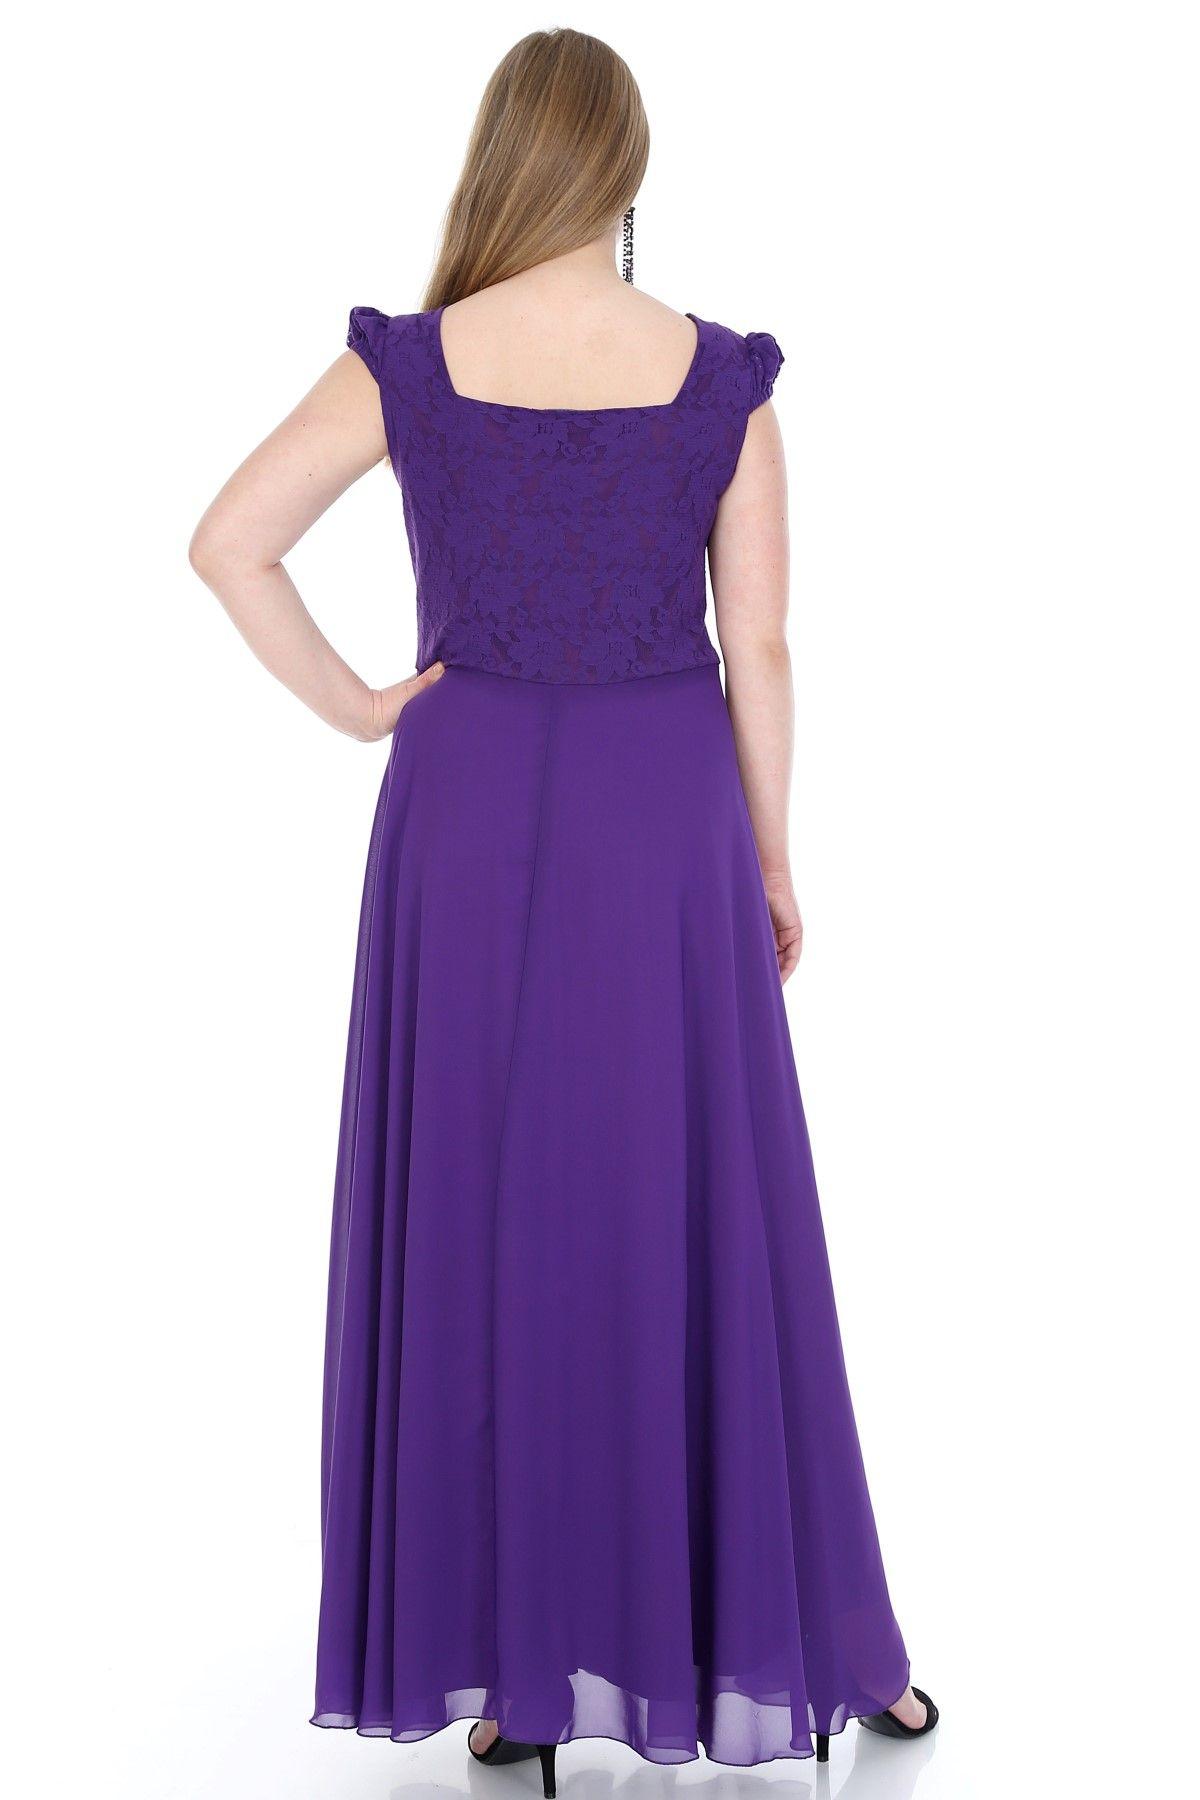 Evening Dress-Bright Blue